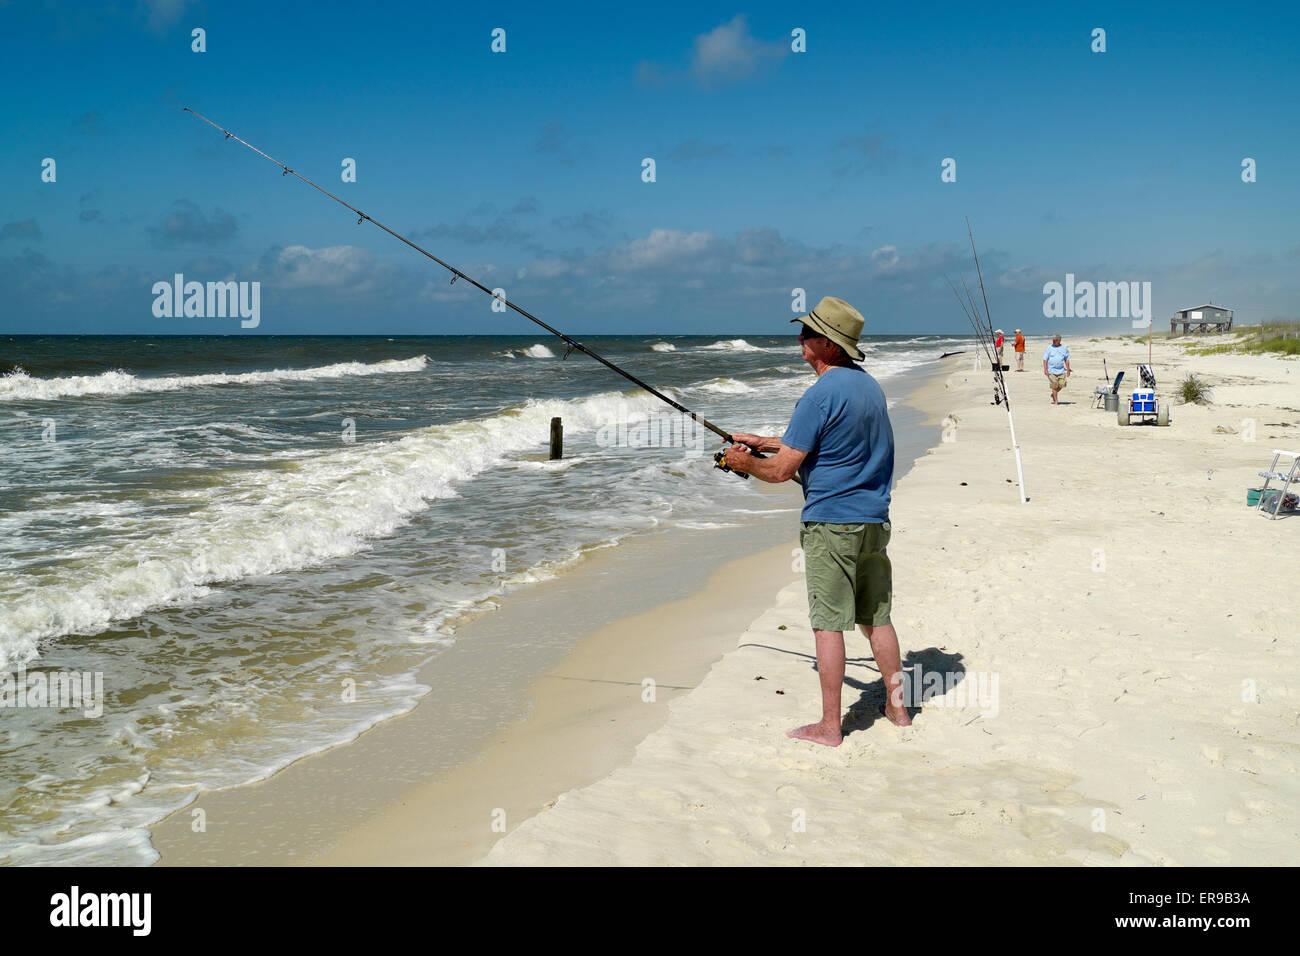 Alabama shoreline stock photos alabama shoreline stock for Surf fishing gulf shores